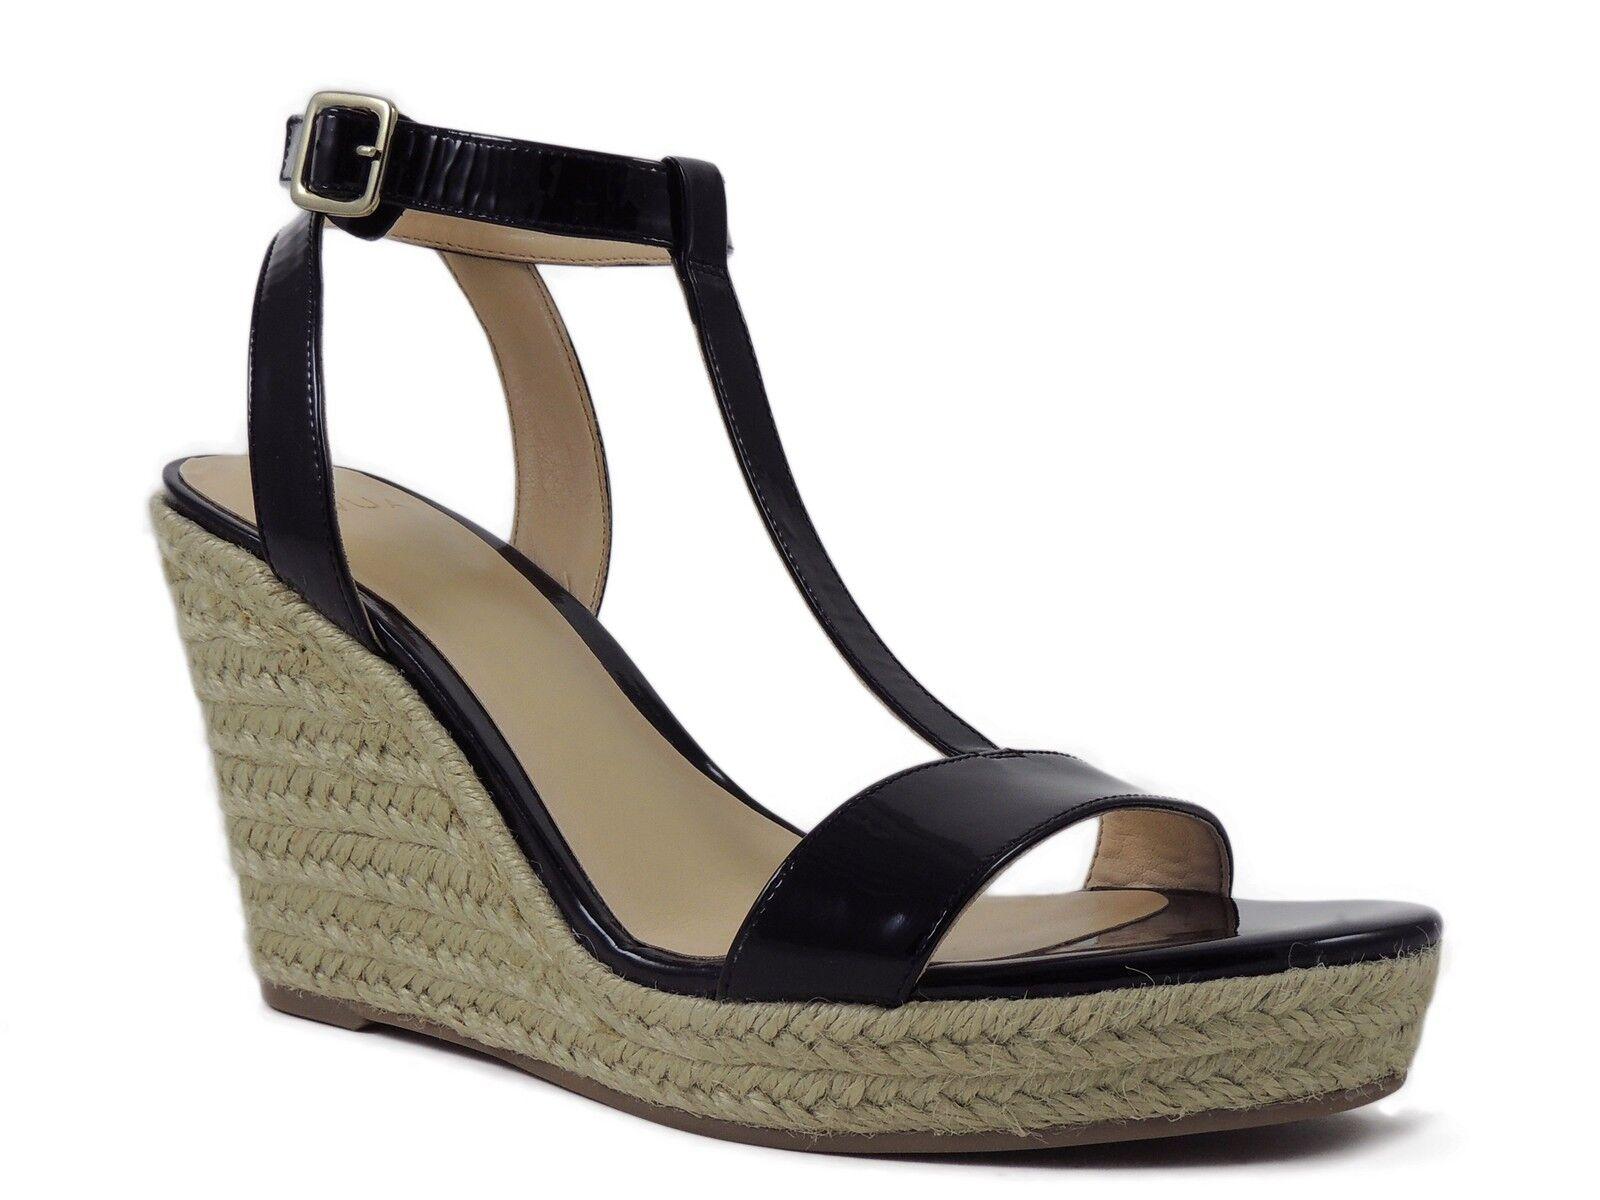 Aqua Women's Hampton Wedge T-Strap Sandals Black Patent Leather Size 8 M